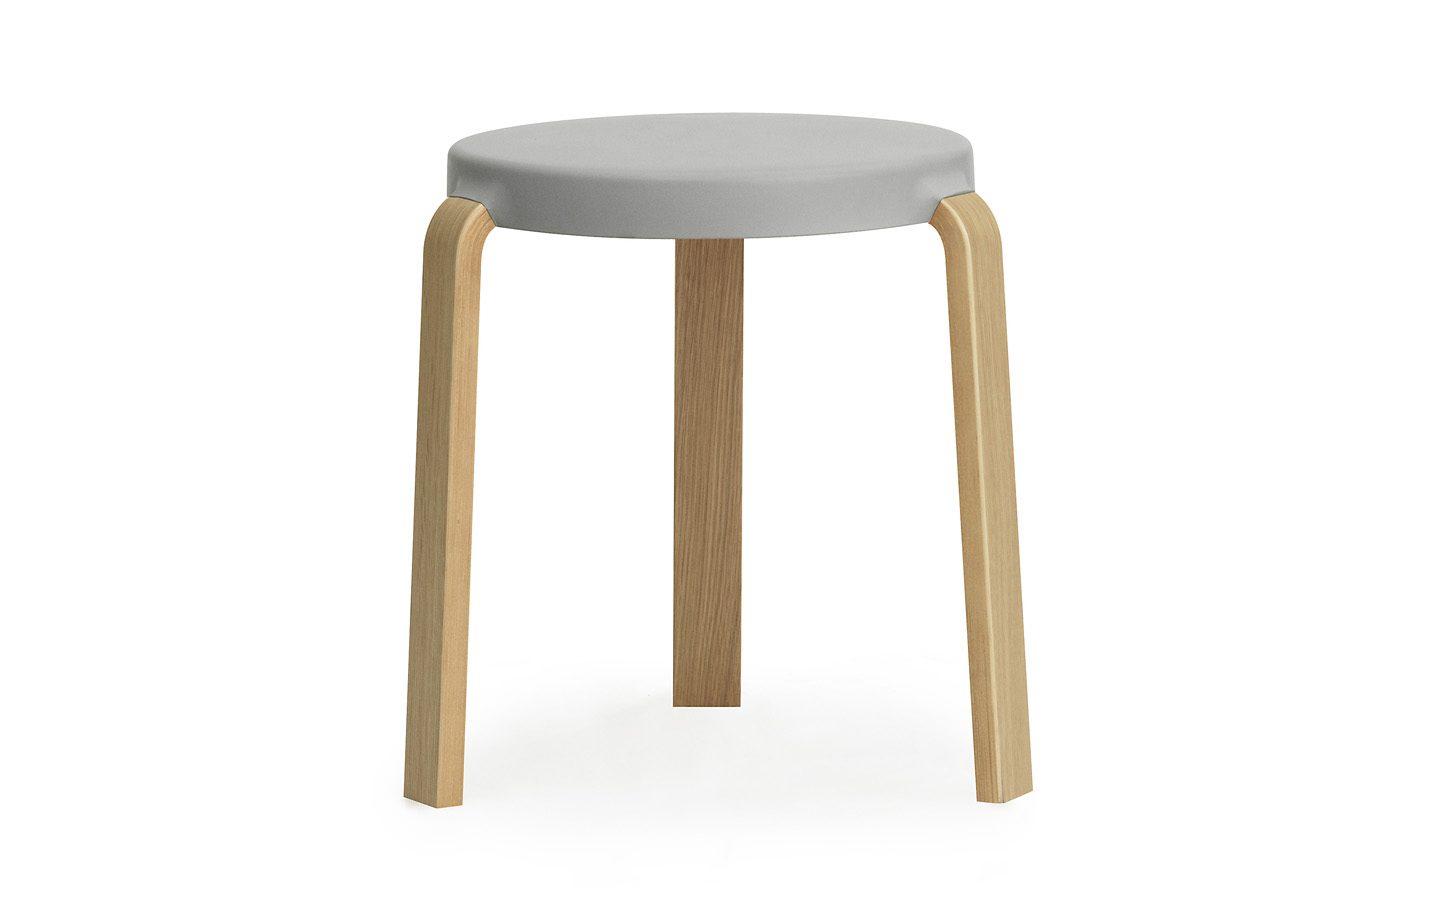 tap-footstool-grey